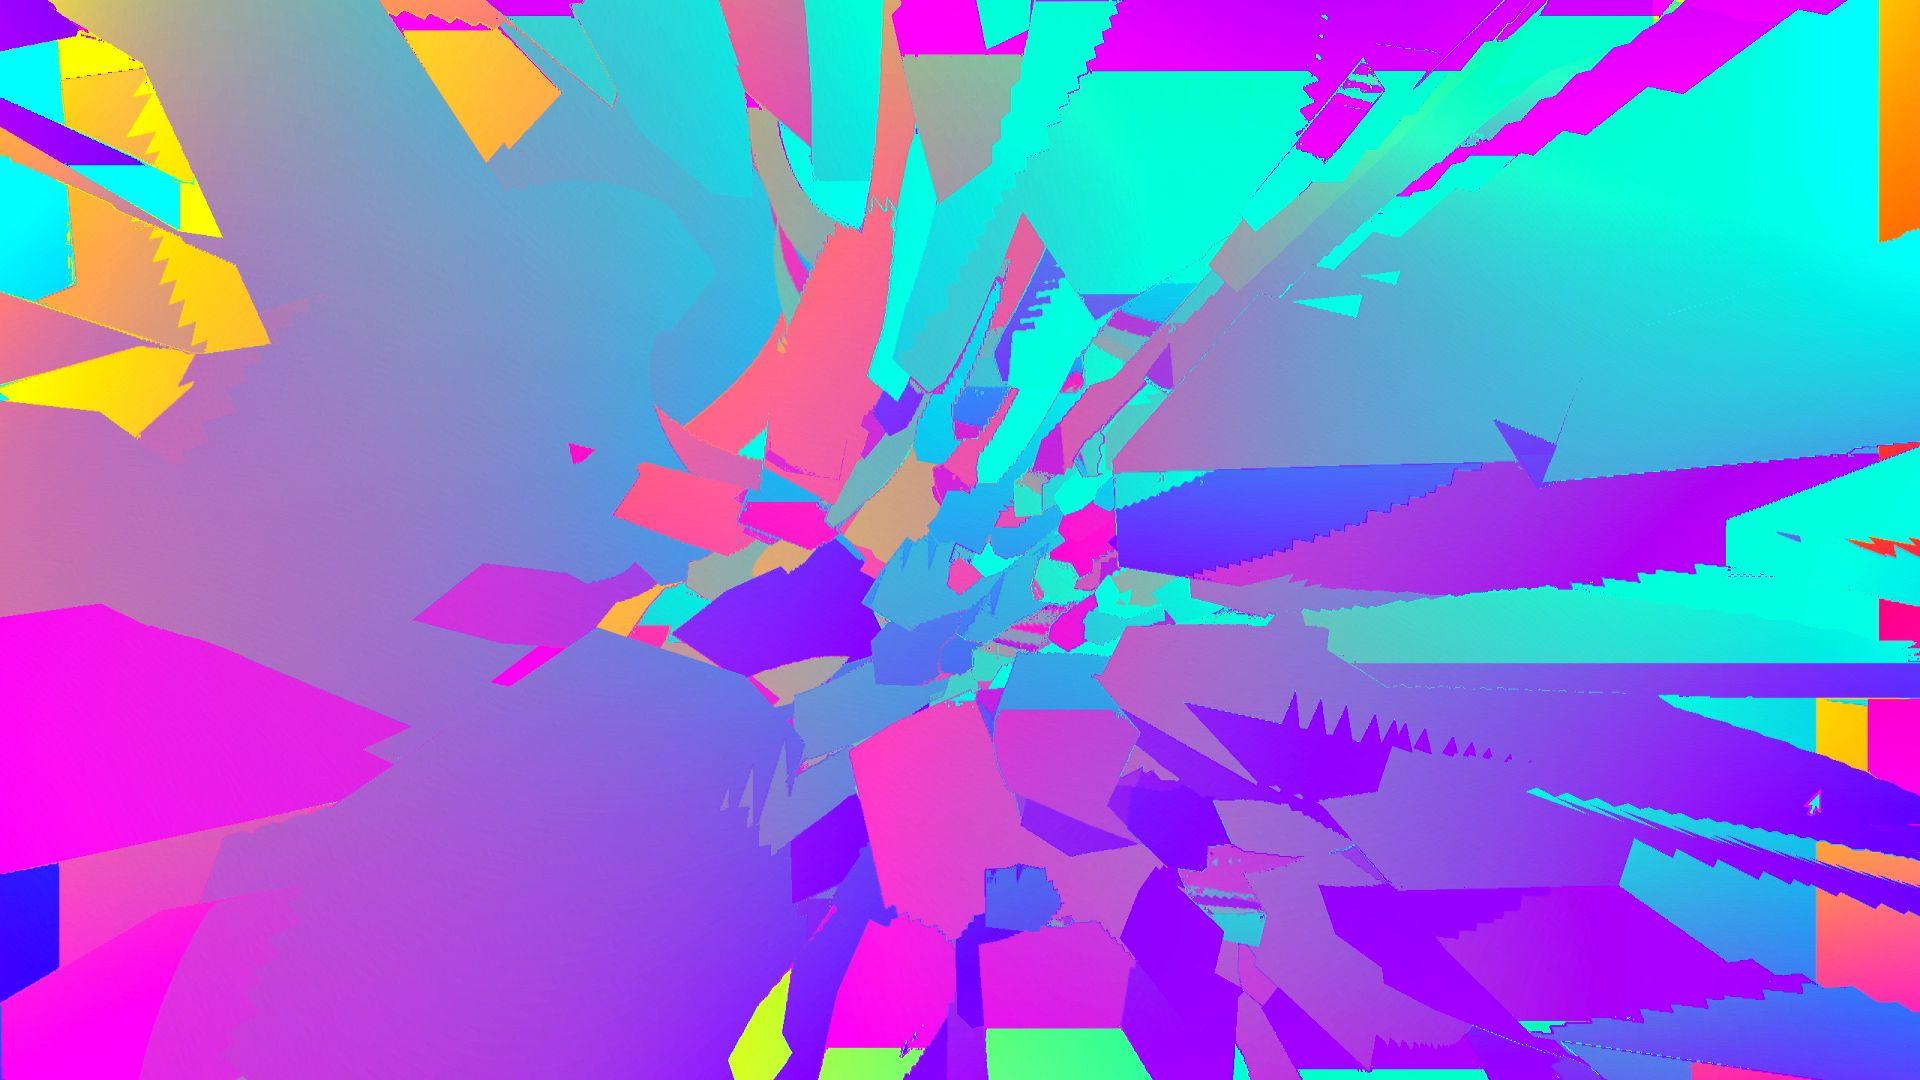 I_AM_MY_MTV_BACKG_10